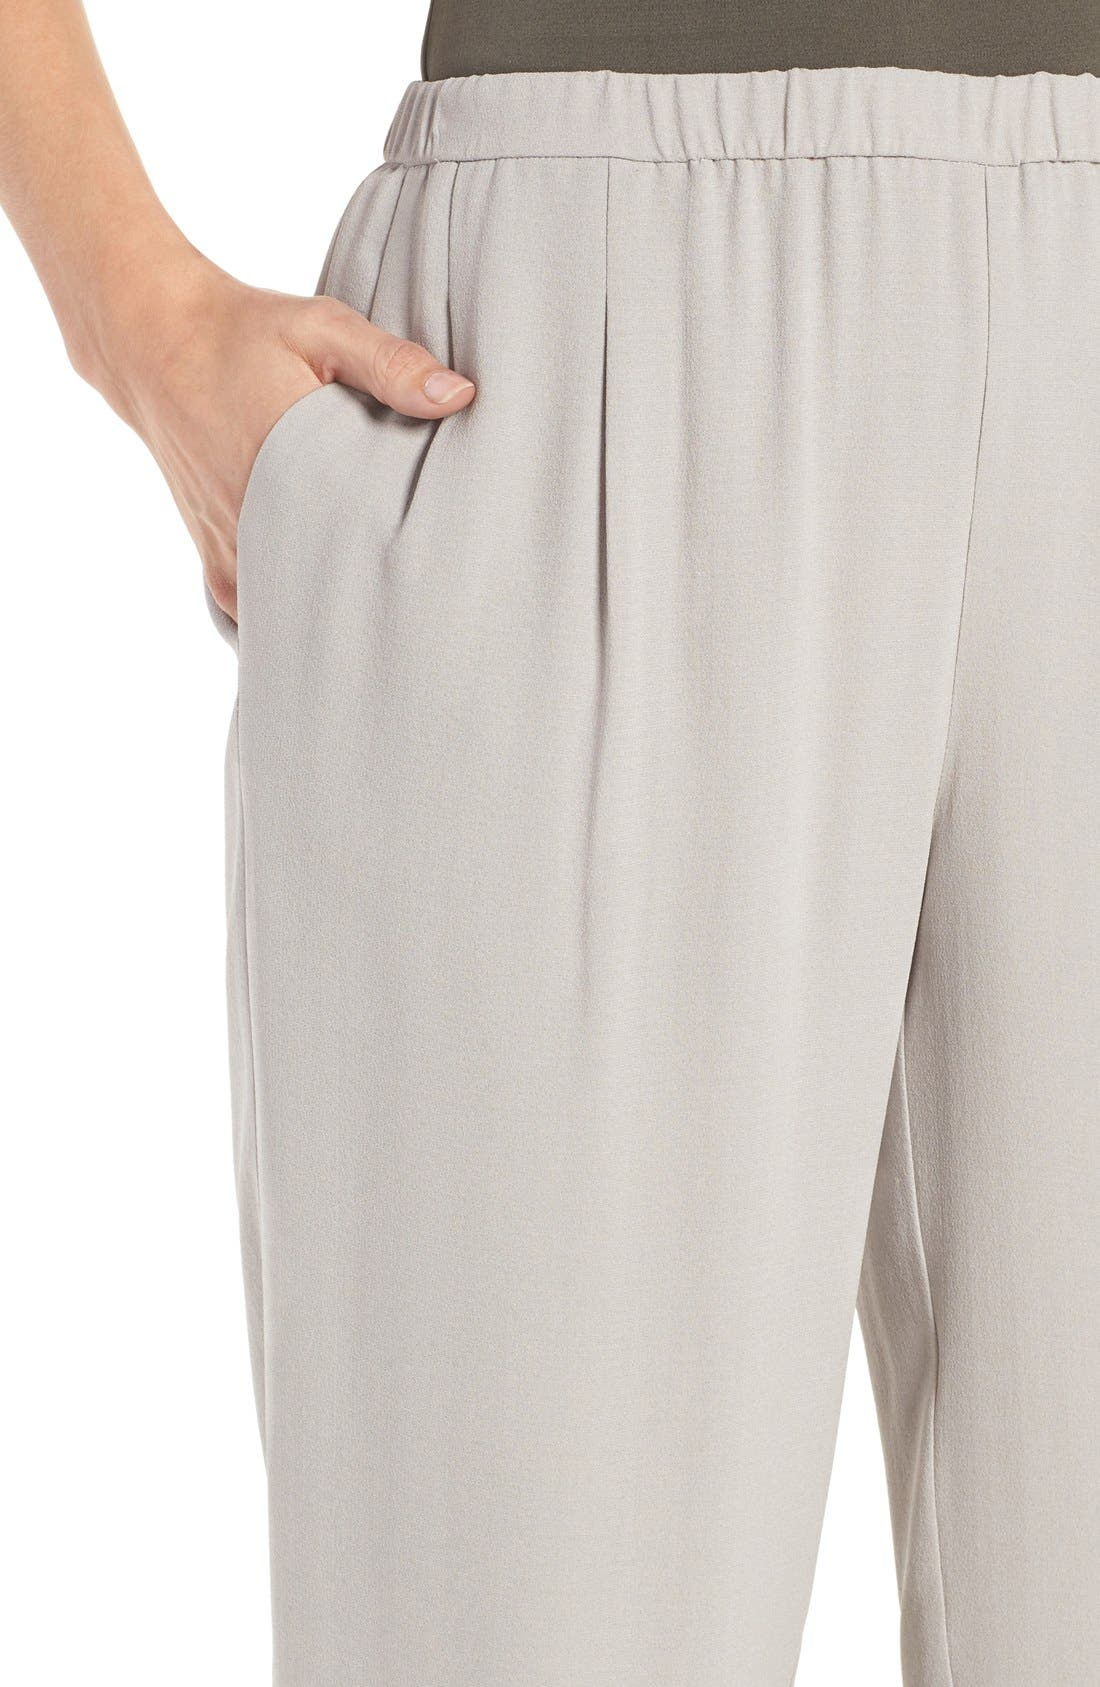 Silk Georgette Crepe Straight Ankle Pants,                             Alternate thumbnail 20, color,